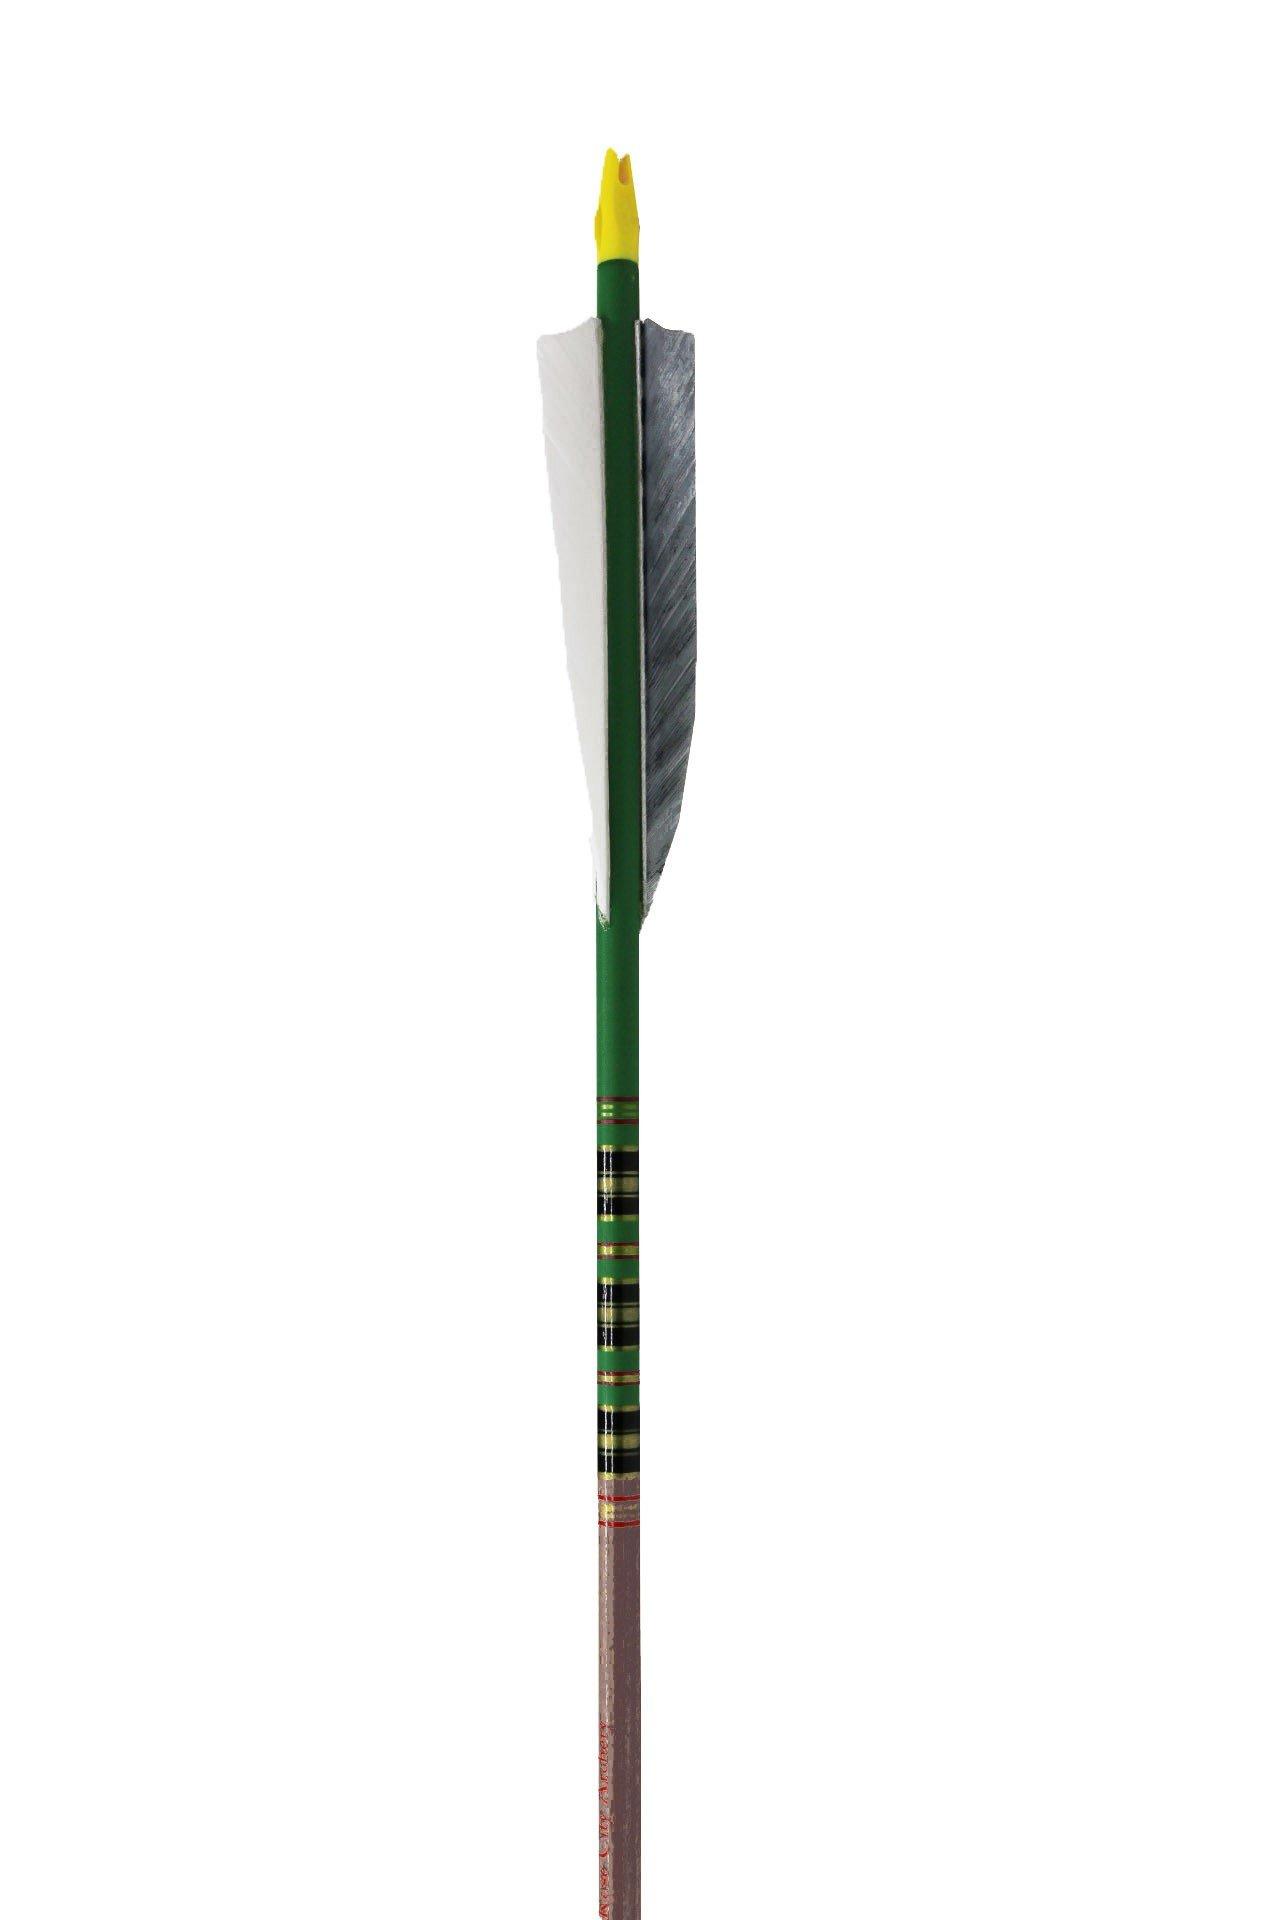 Rose City Archery Port Orford Cedar Fancy Arrows with 4'' Shield Fletch (12 Pack), Green/Walnut